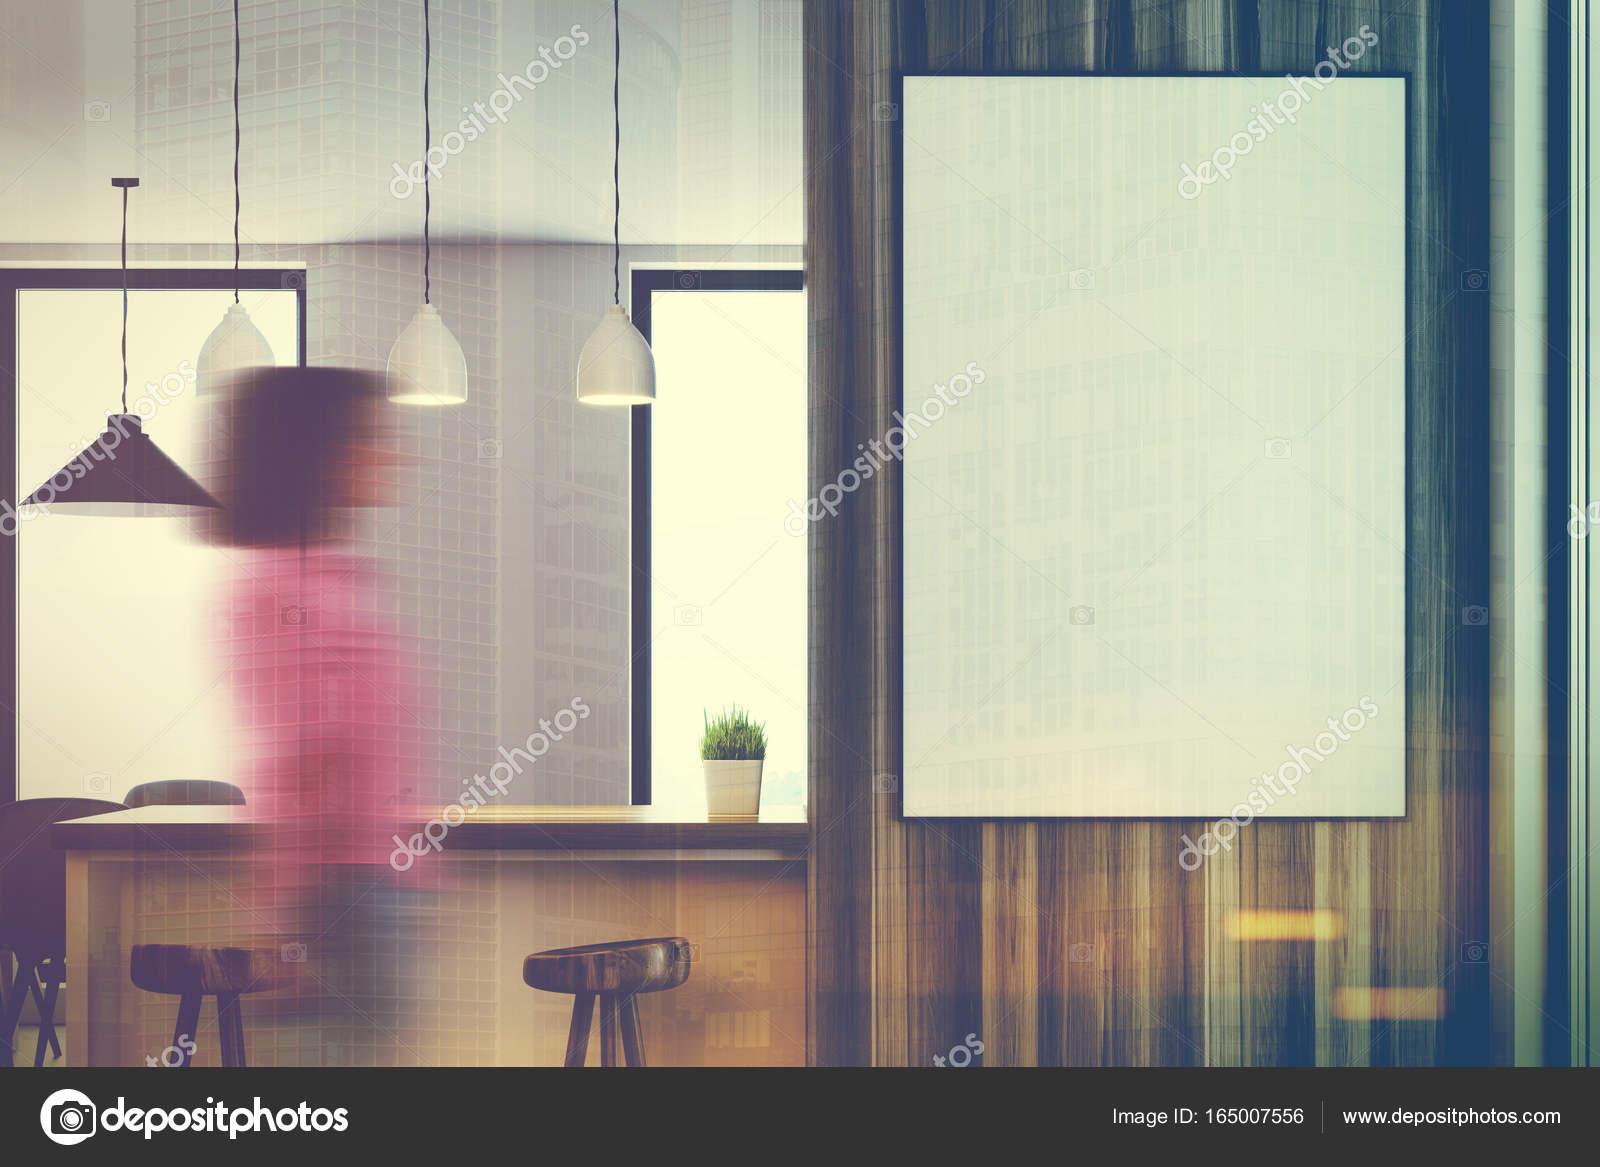 Cocina blanca de madera, mostradores, cartel, chica — Foto de stock ...